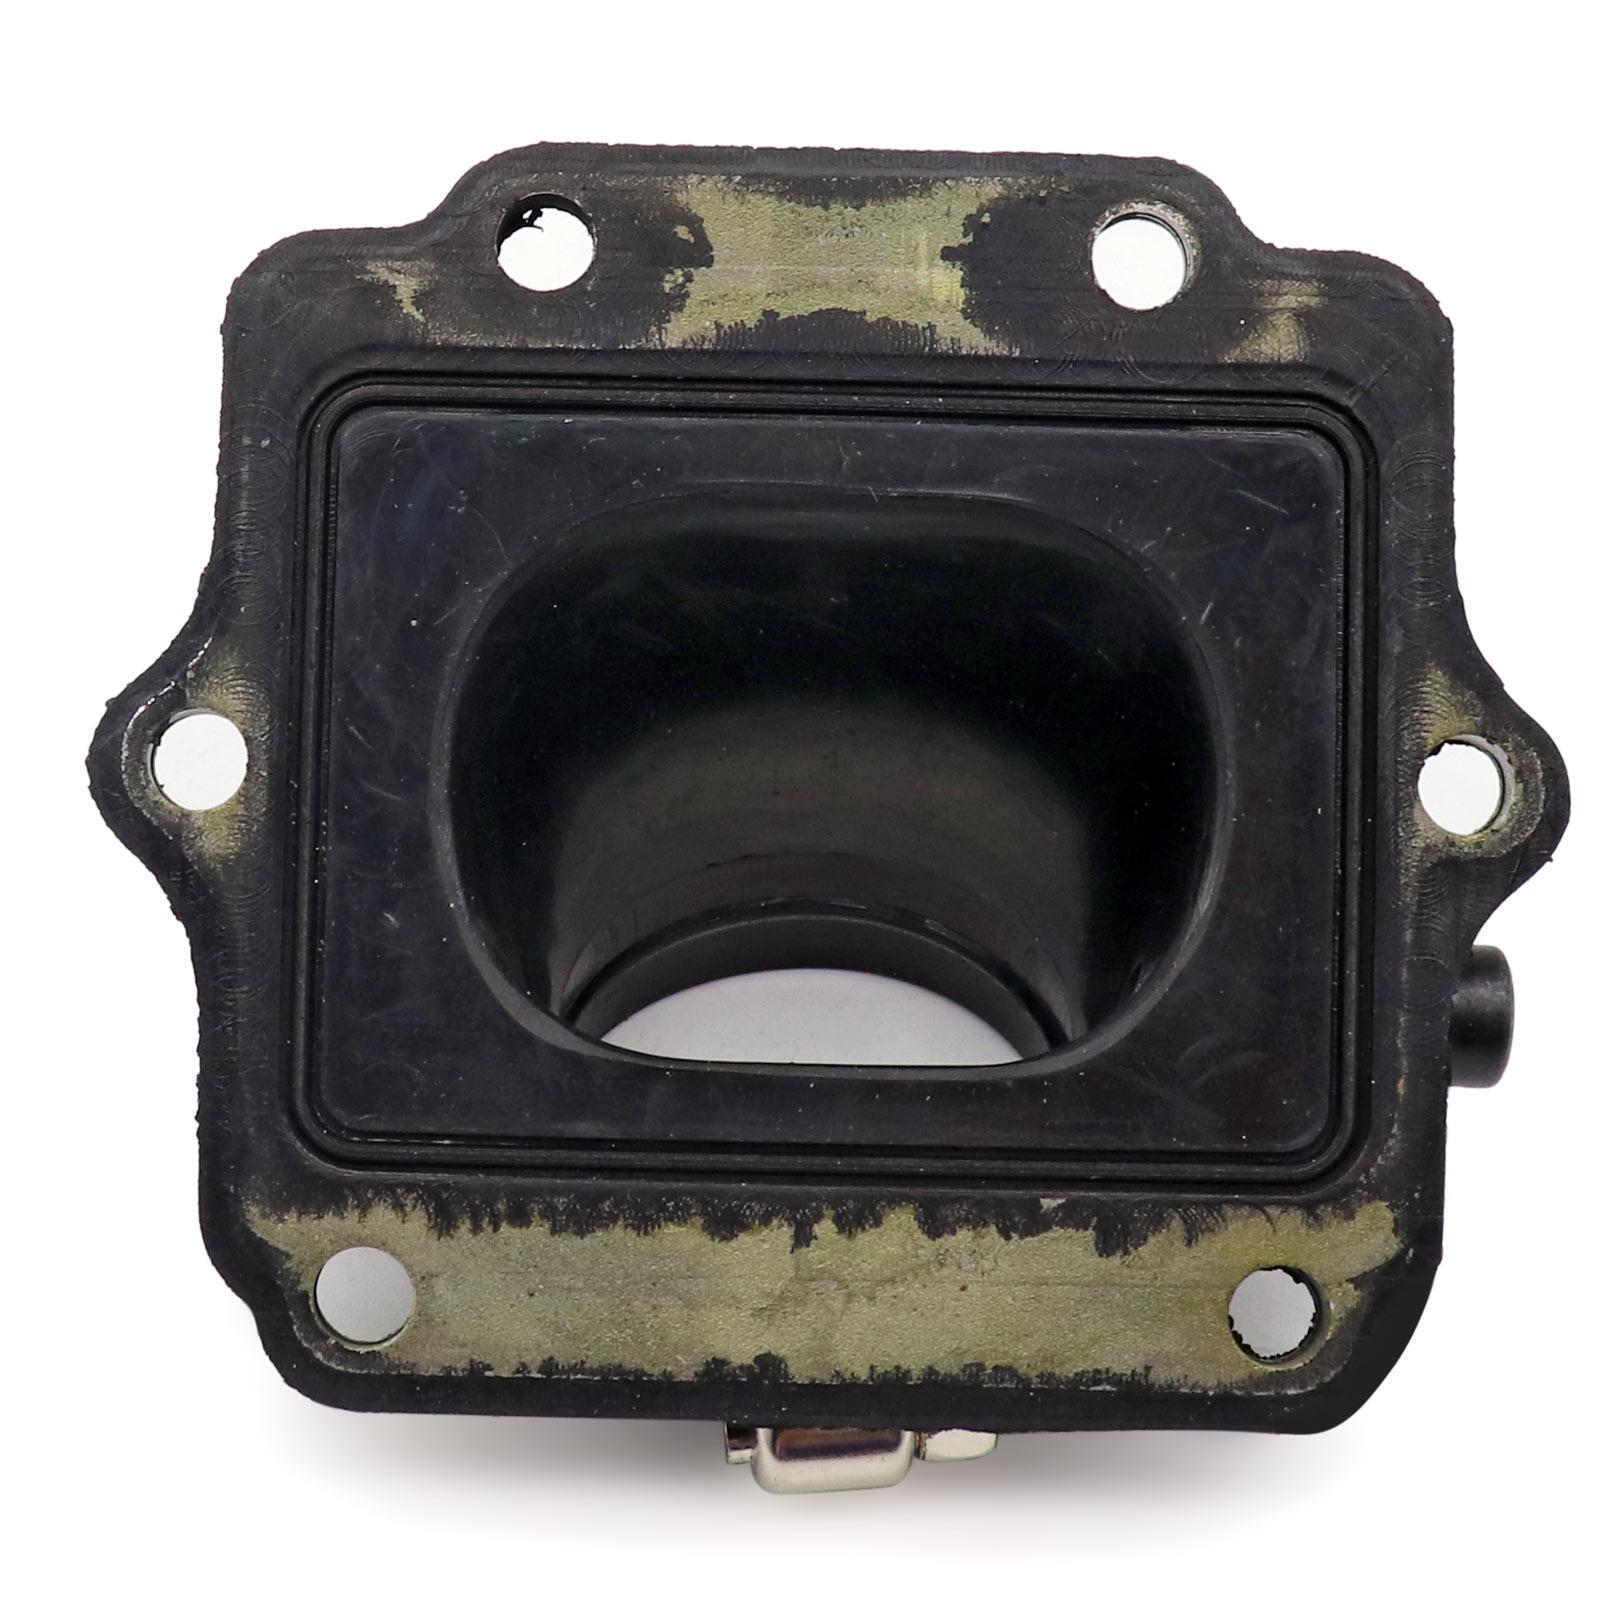 Carburetor Intak Manifold Boot 3084143 Fit For Polaris ATV 350L 400L 1990-1995